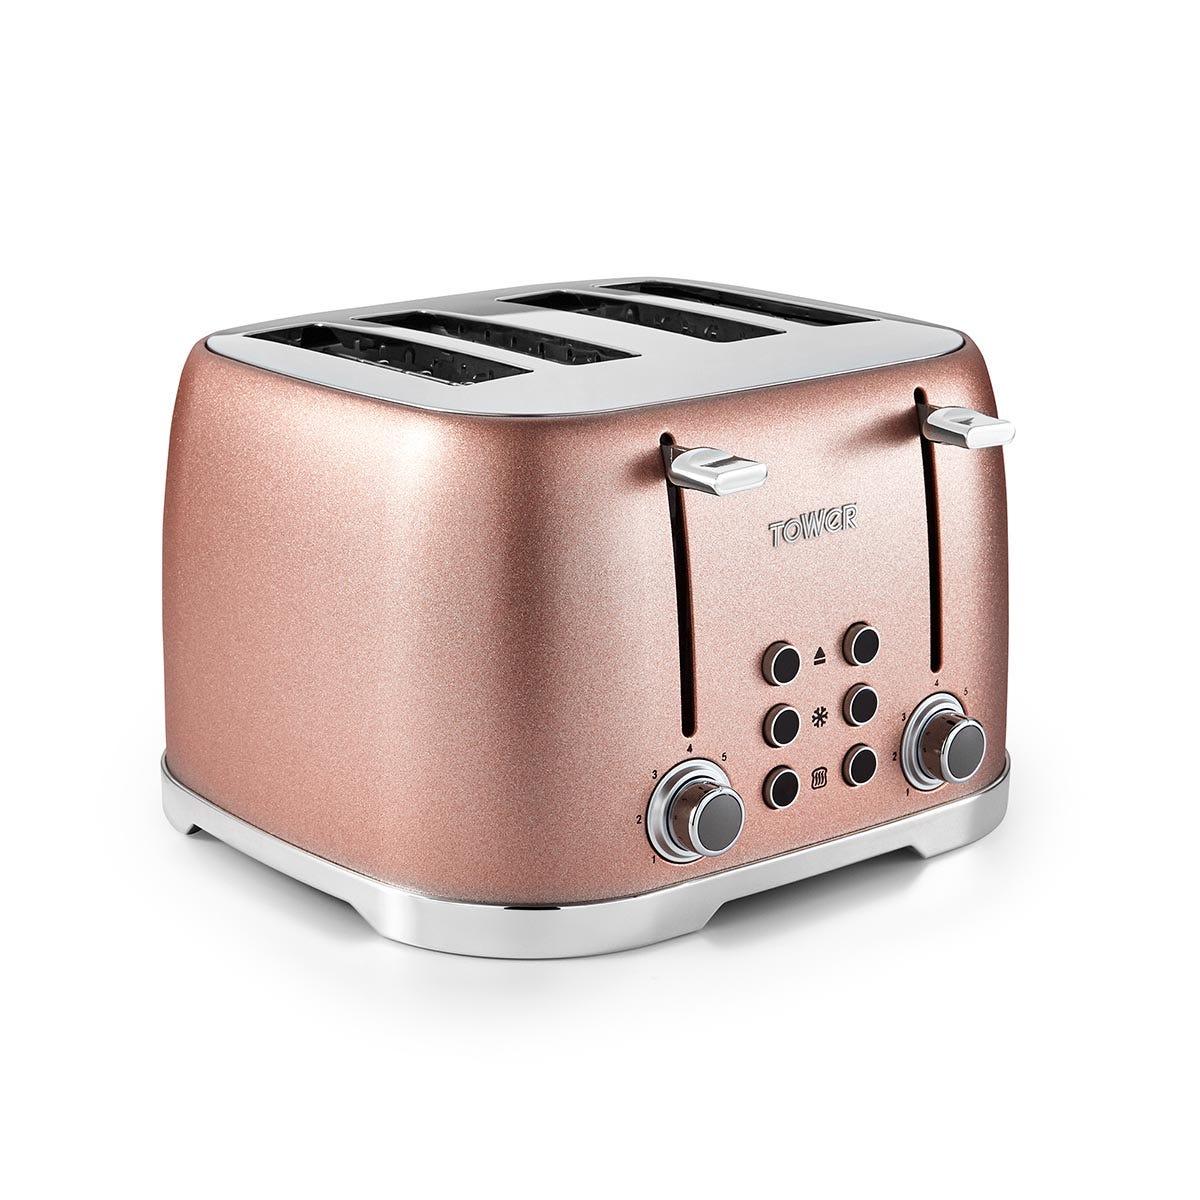 Tower T20030BP Glitz 4-Slice Toaster - Blush Pink